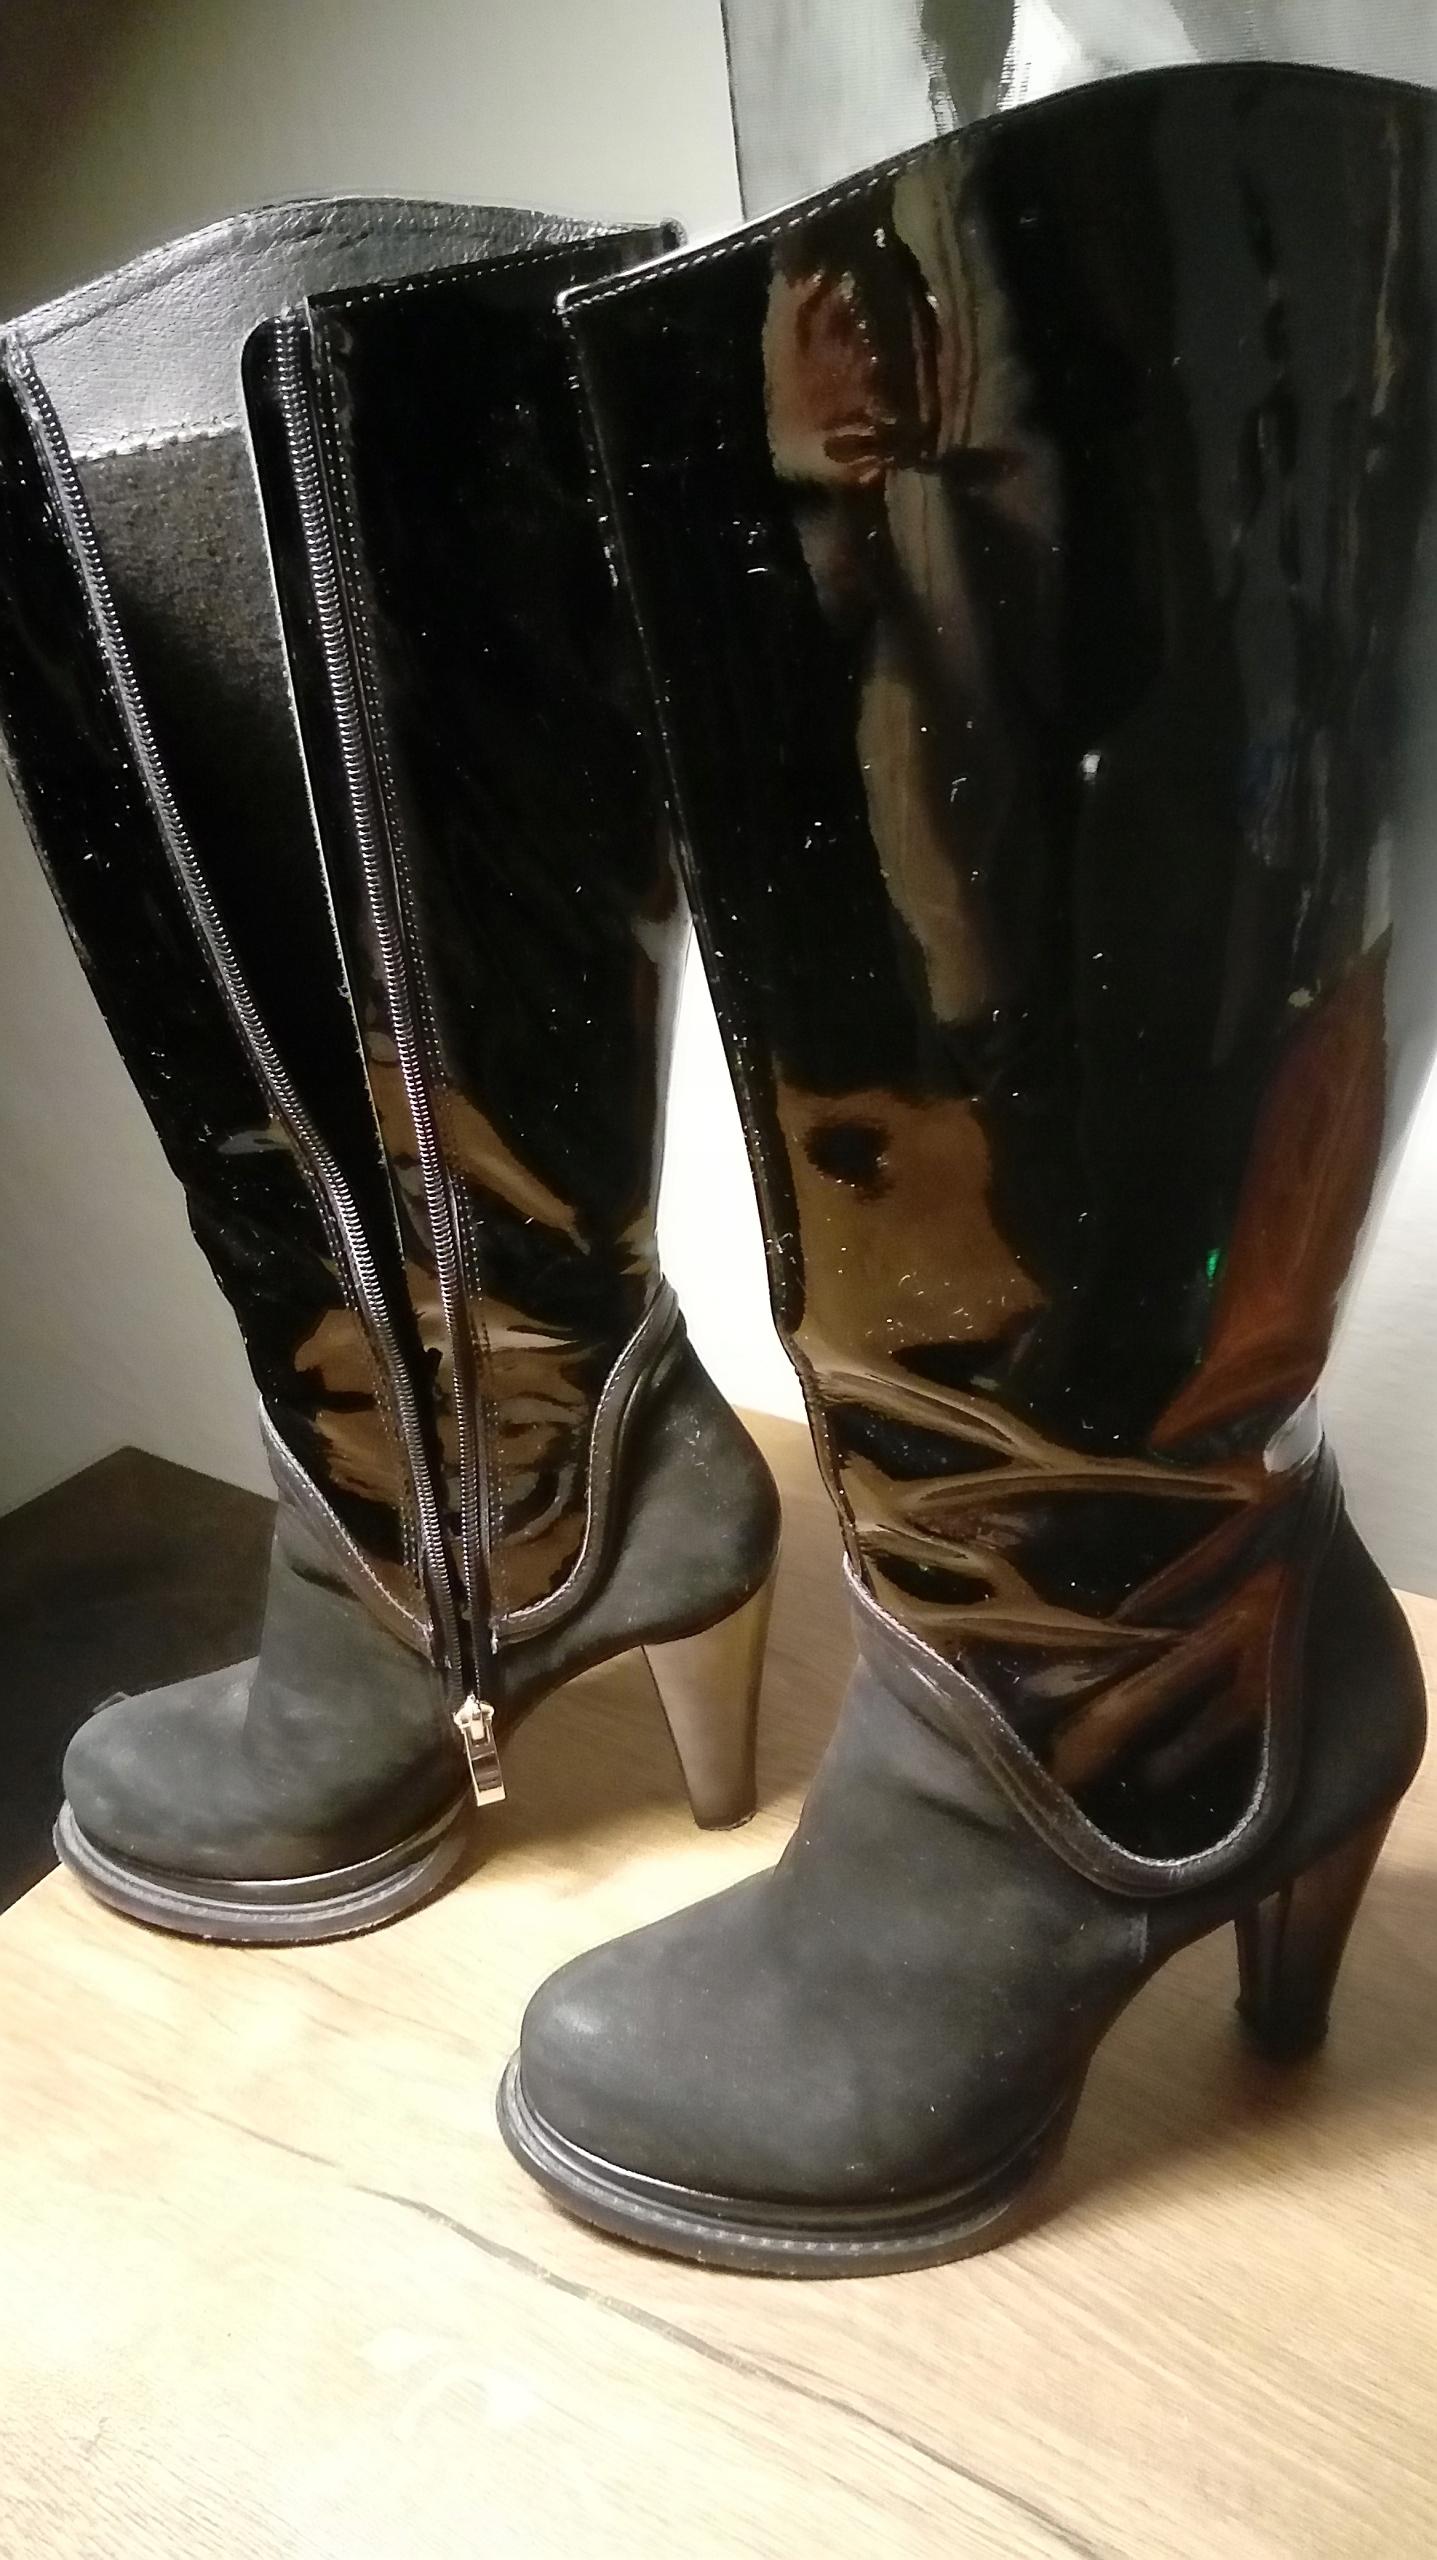 9a707567efe9e Kazar buty kozaki skóra nat.lakierowana 36 j.nowe - 7655925286 ...